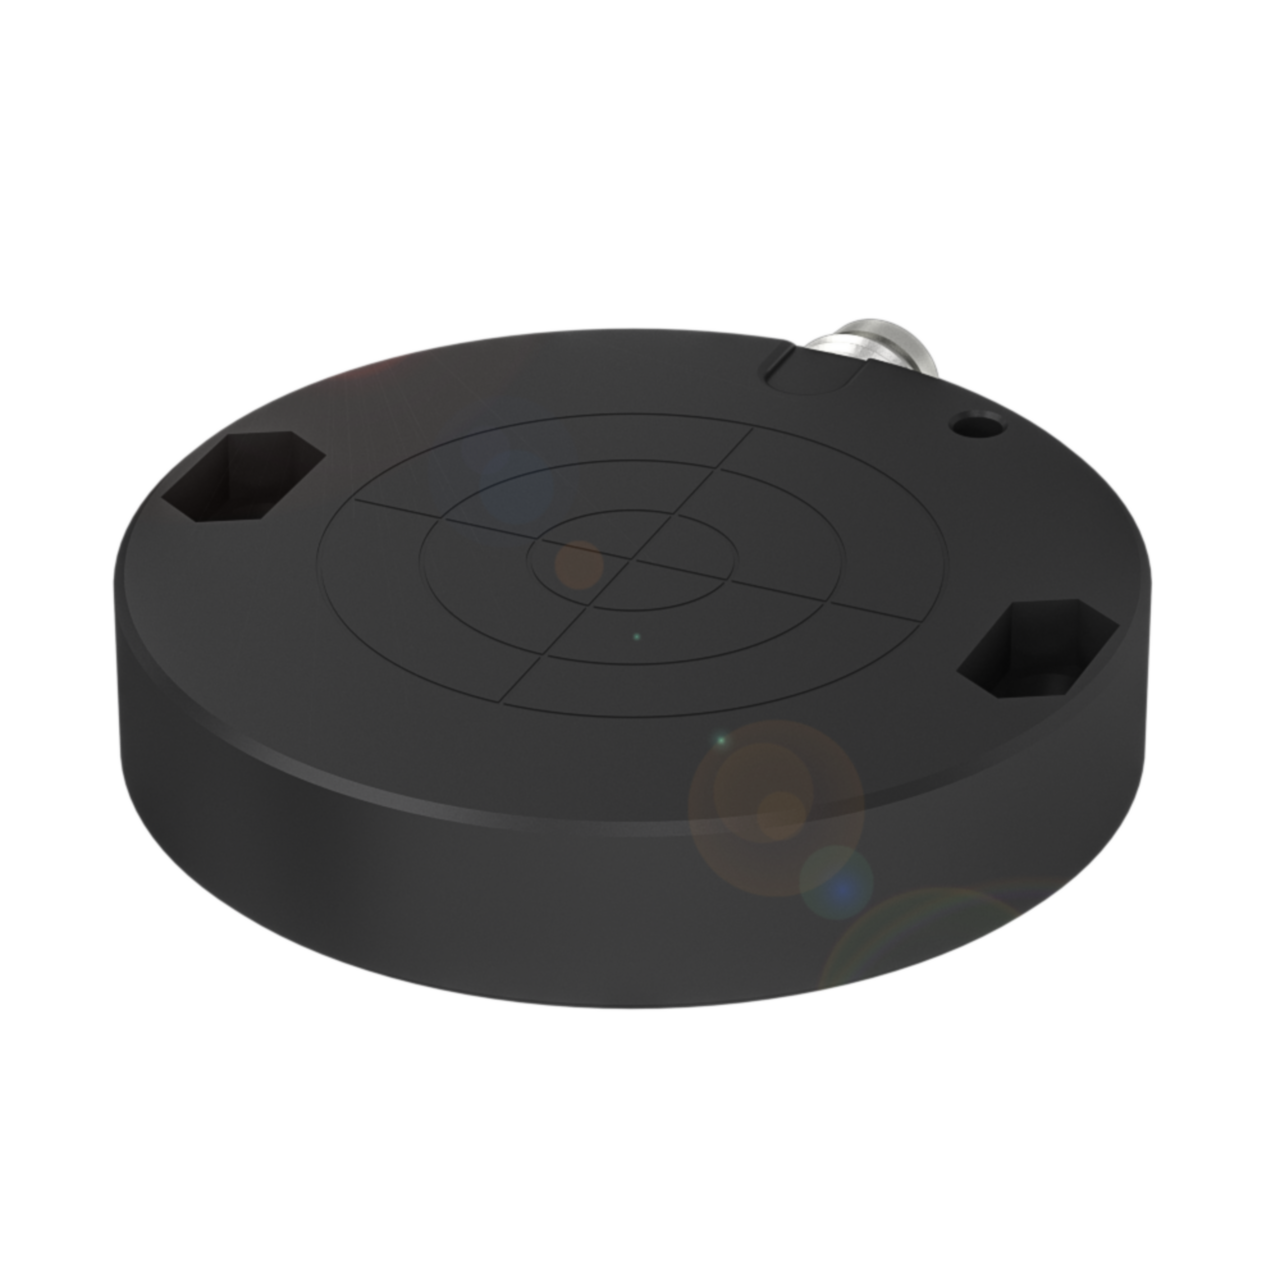 BCS20L BCS D20OO20 YPC20C S20G Kapazitive Sensoren zur ...